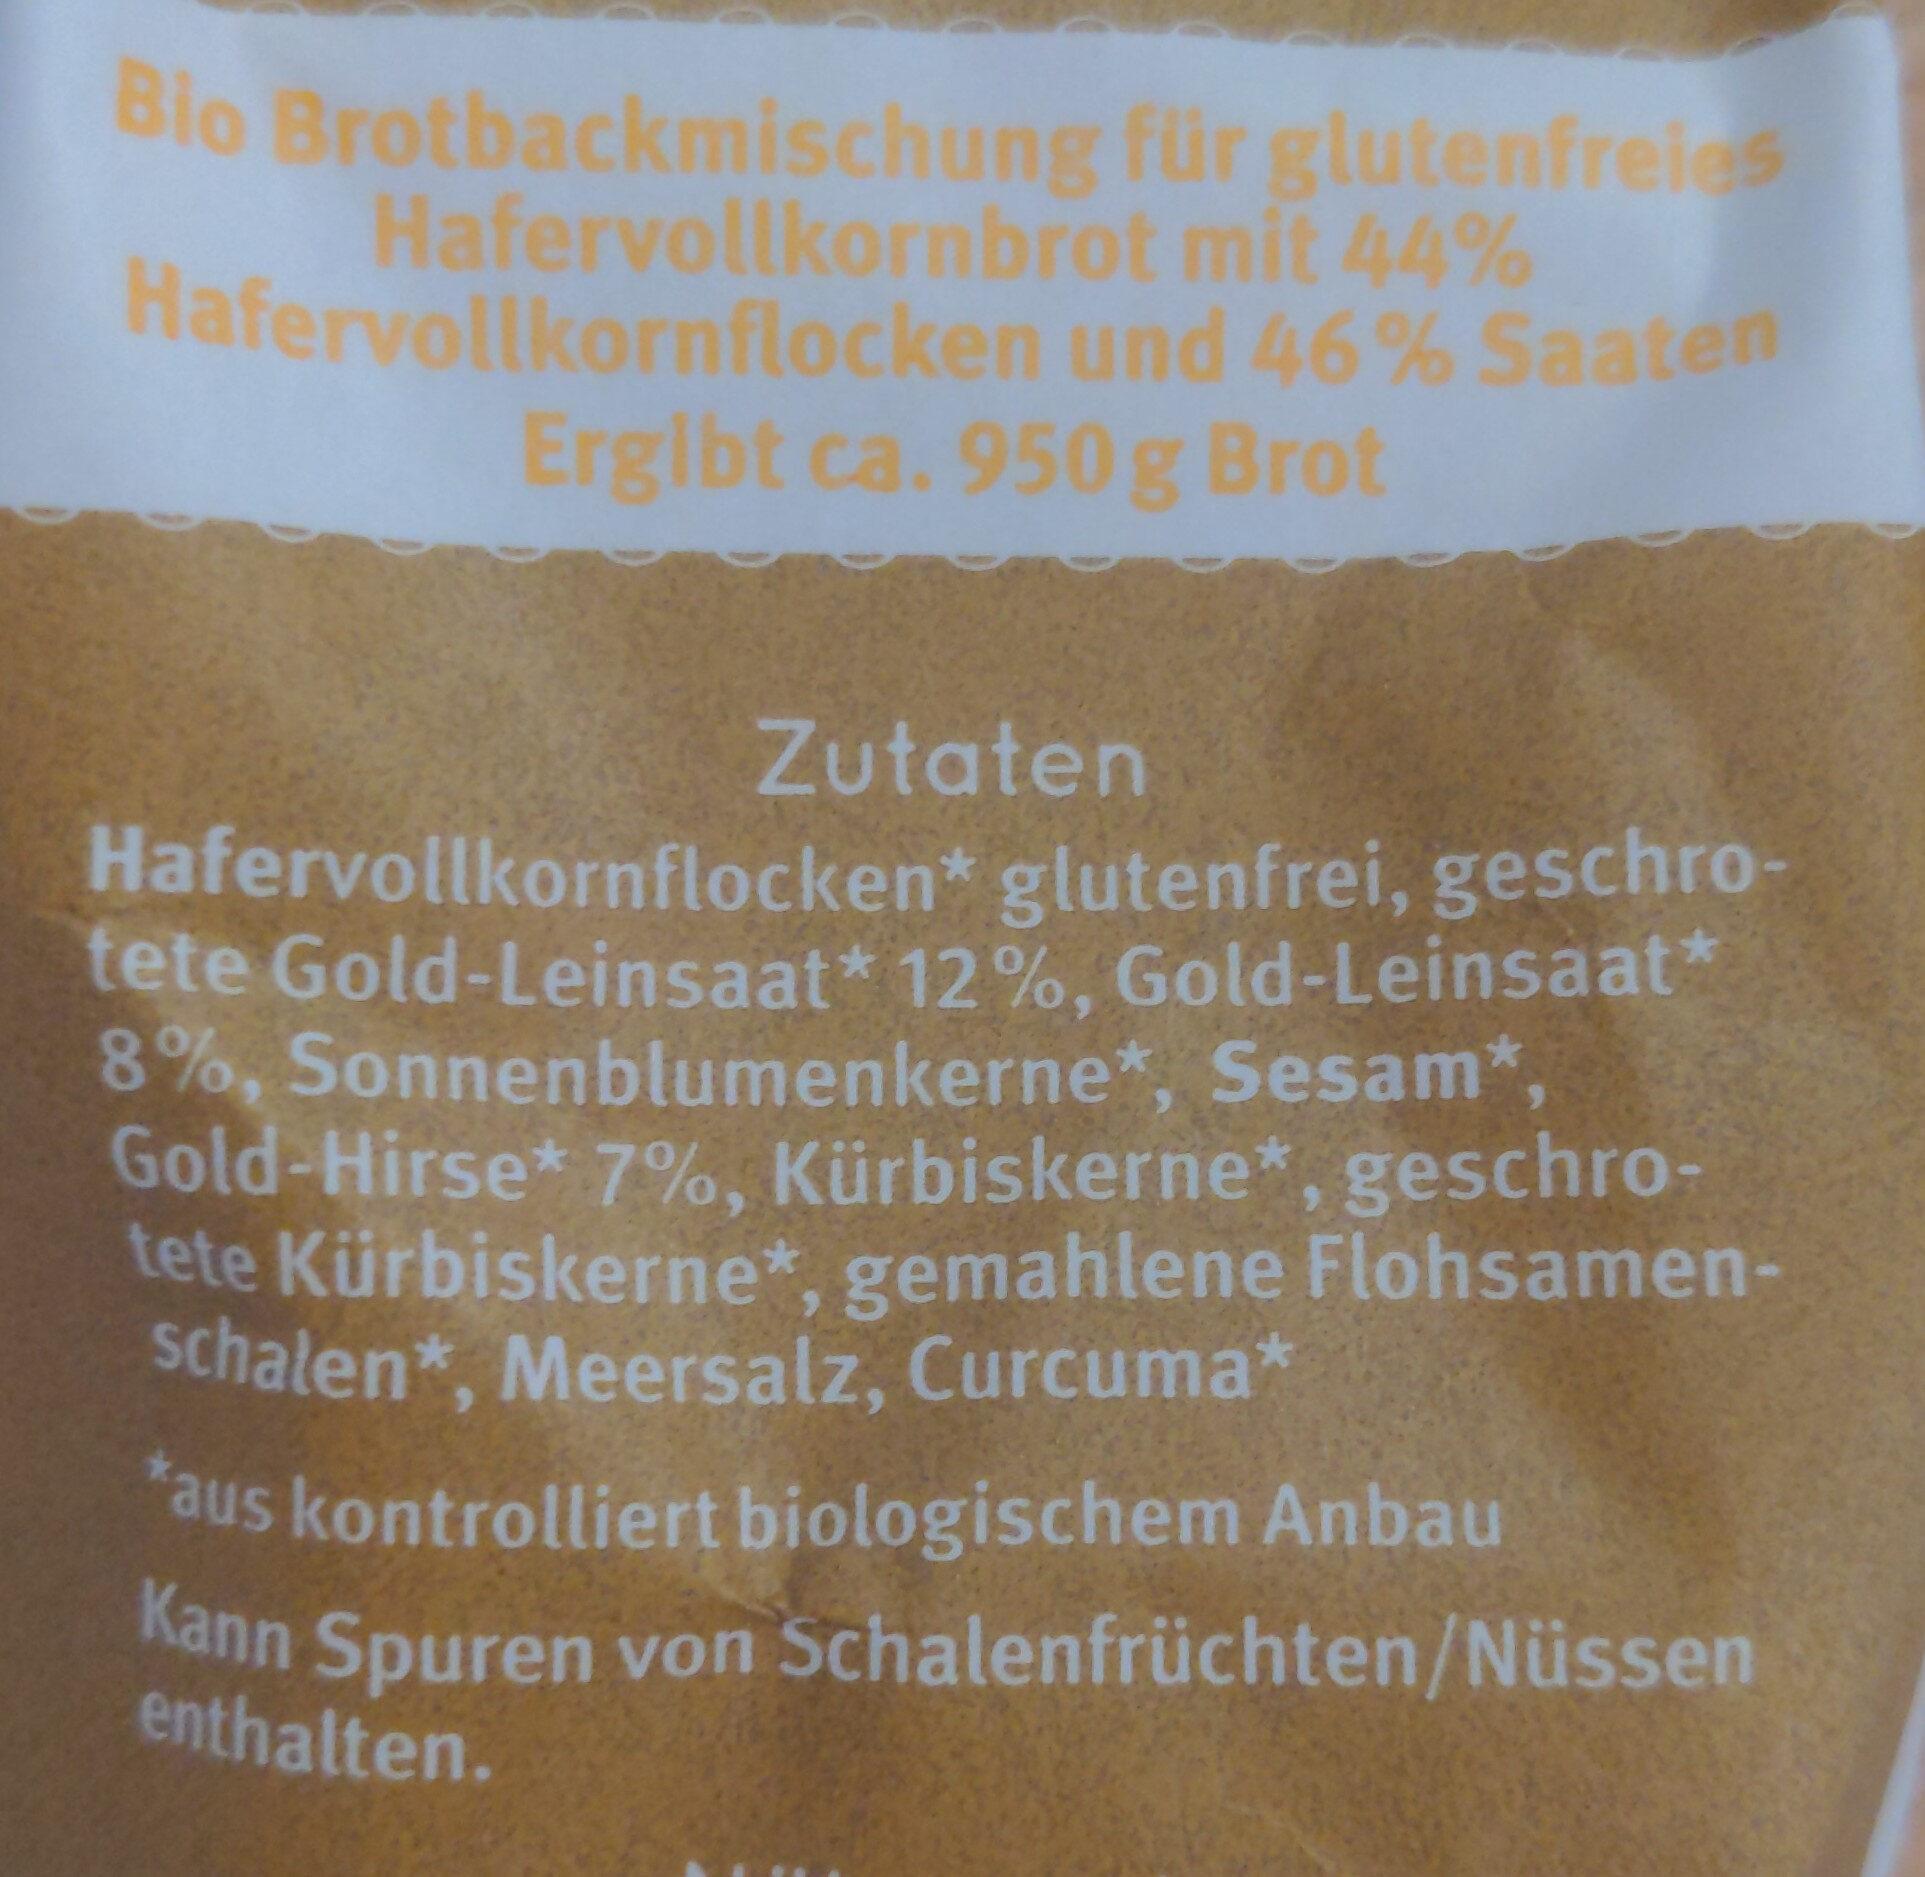 Bio Backbrotmischung for glutenfreies Hafervollkornbrot - Ingredienti - de